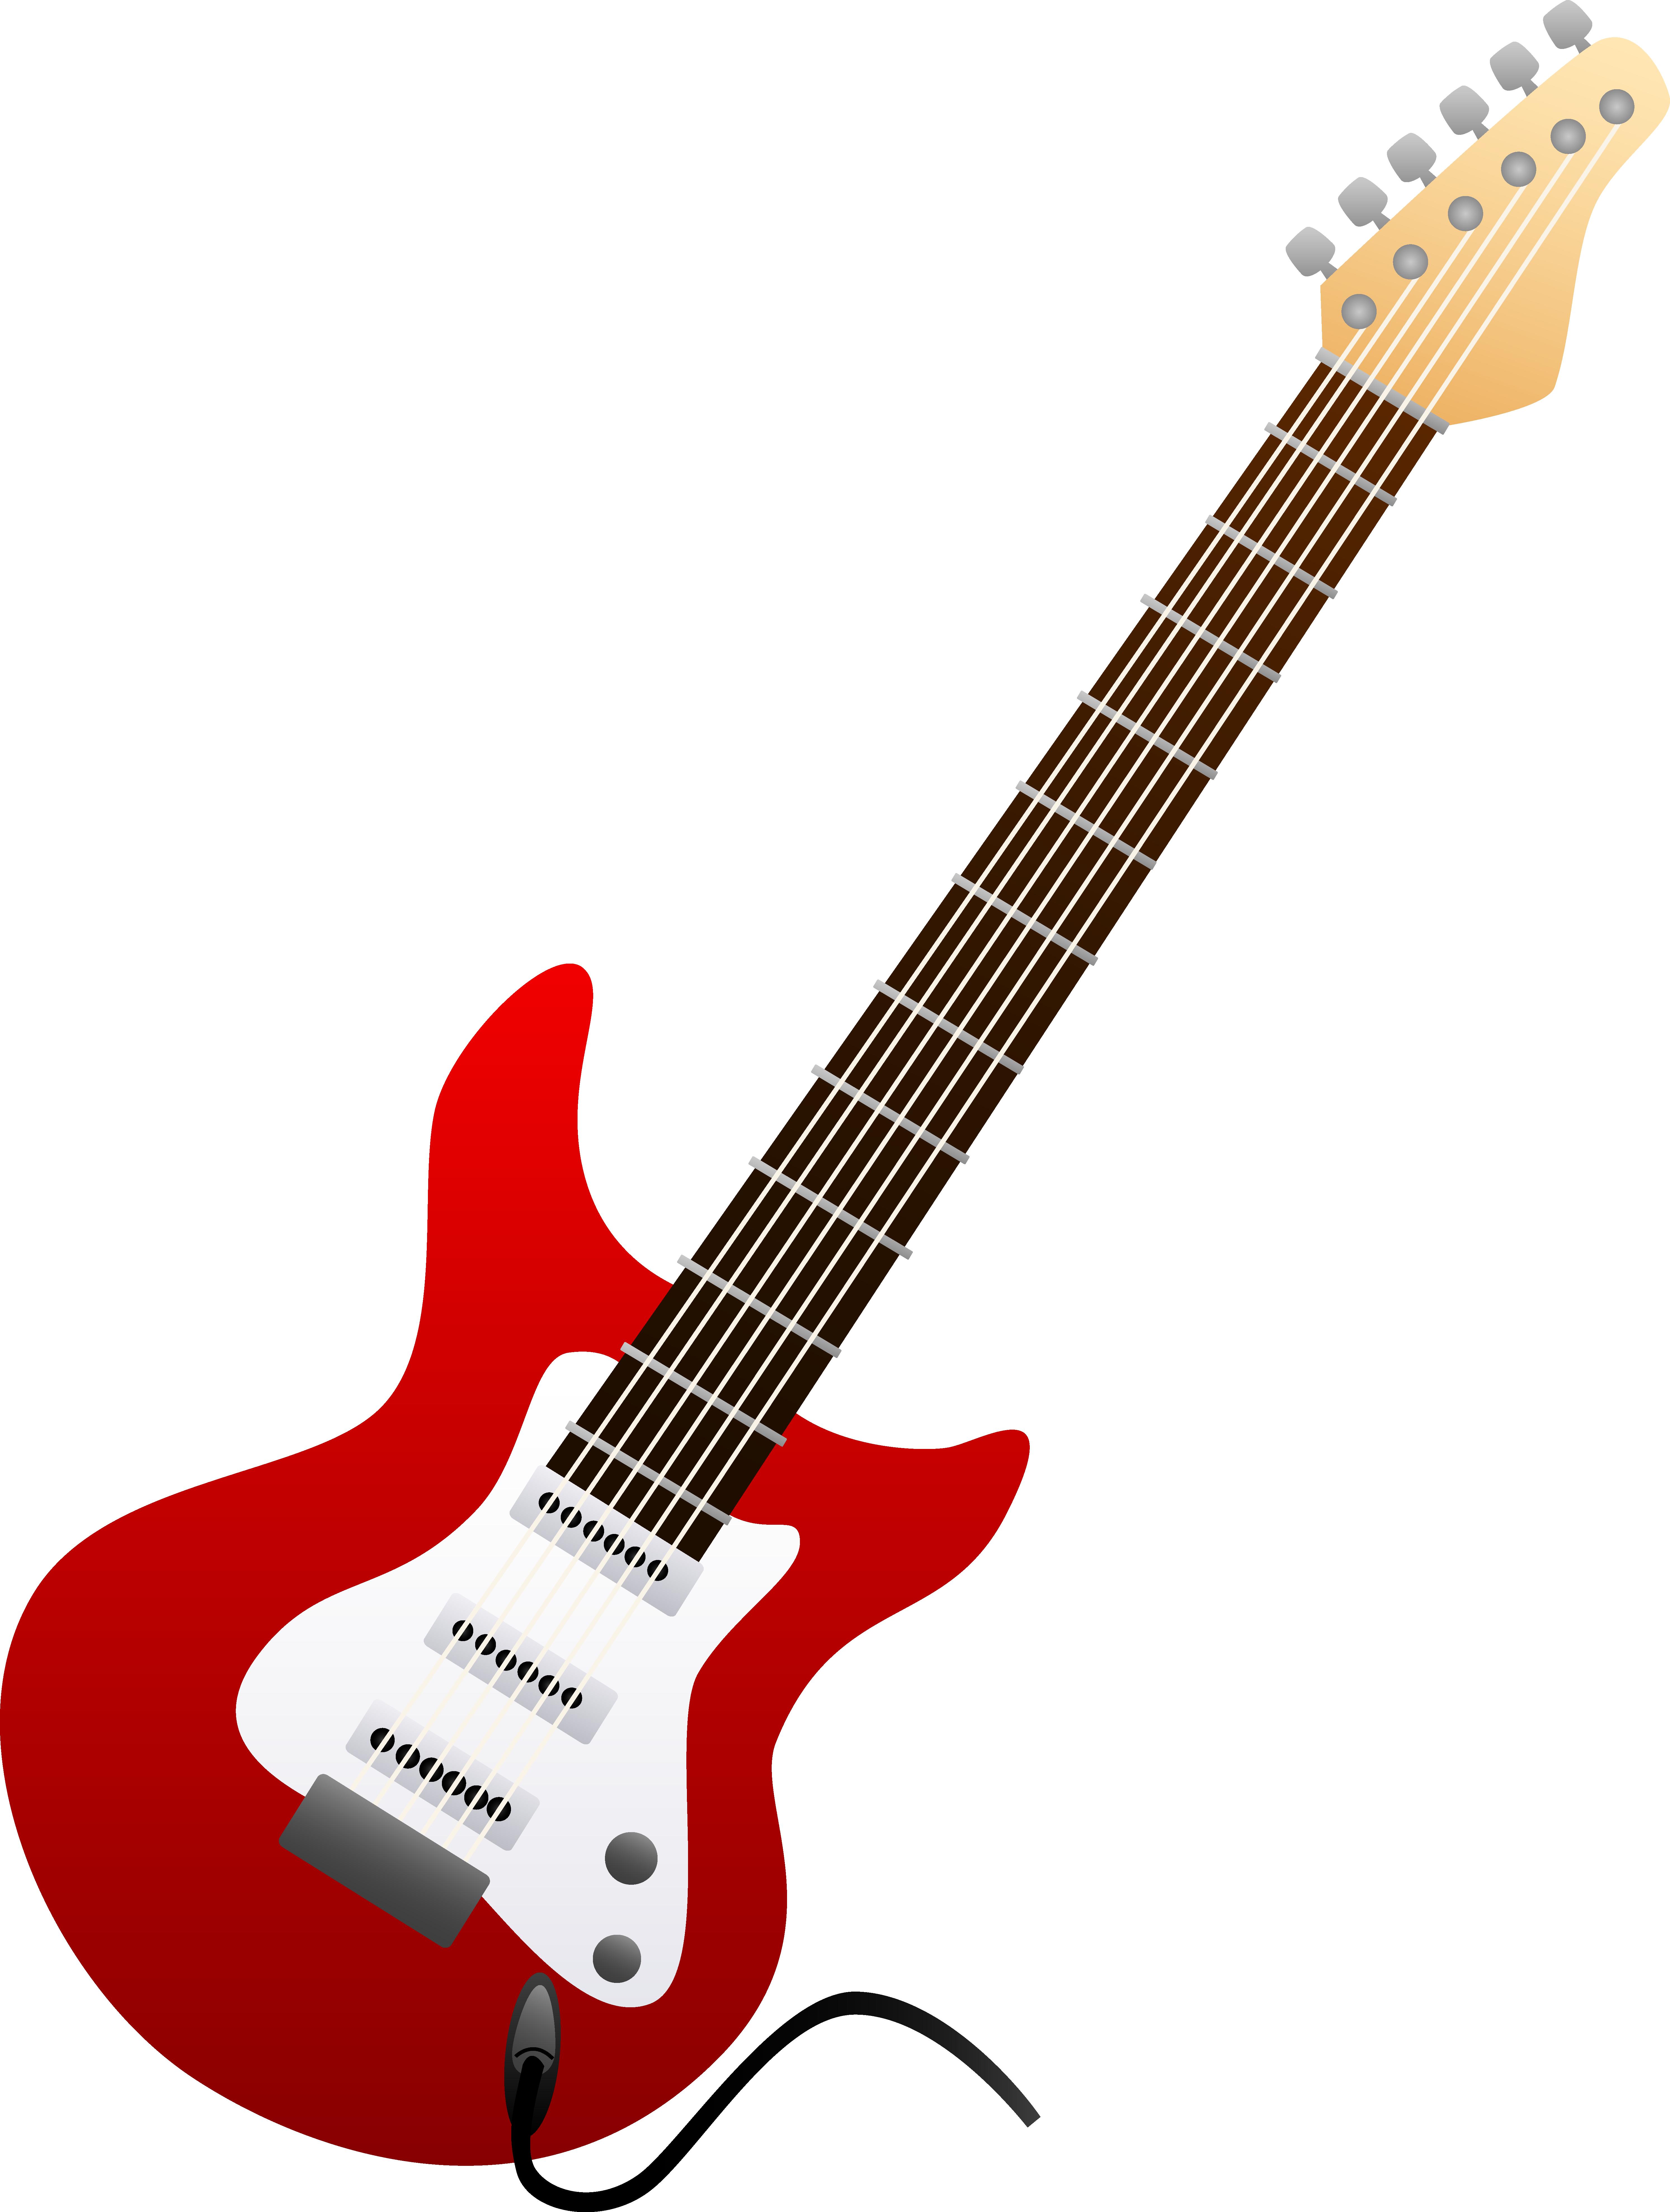 5971x7908 Rock Star Guitar Clip Art Free Clipart Images